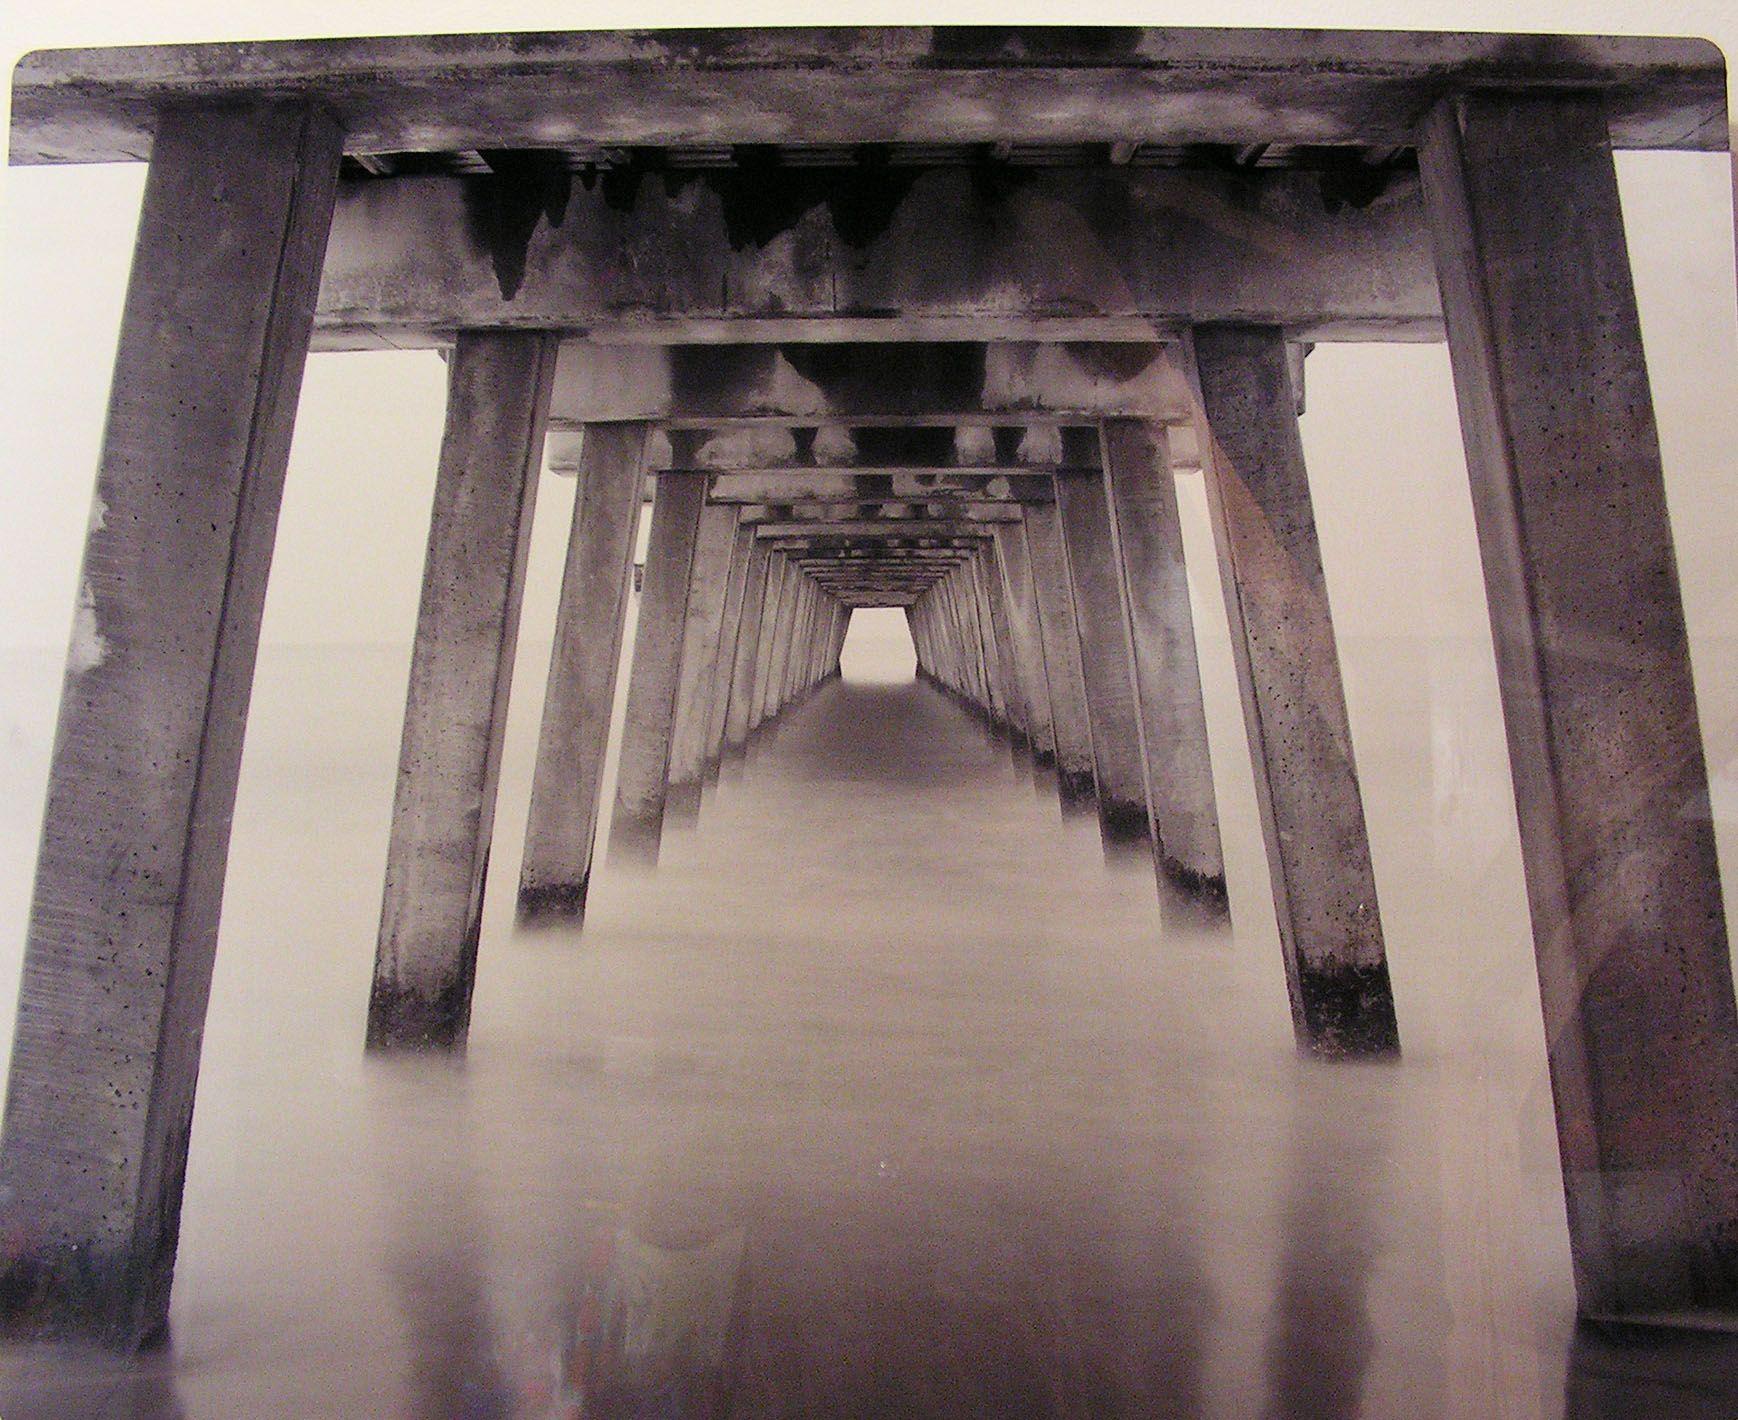 Bruce Edelstein - Tybee Pier